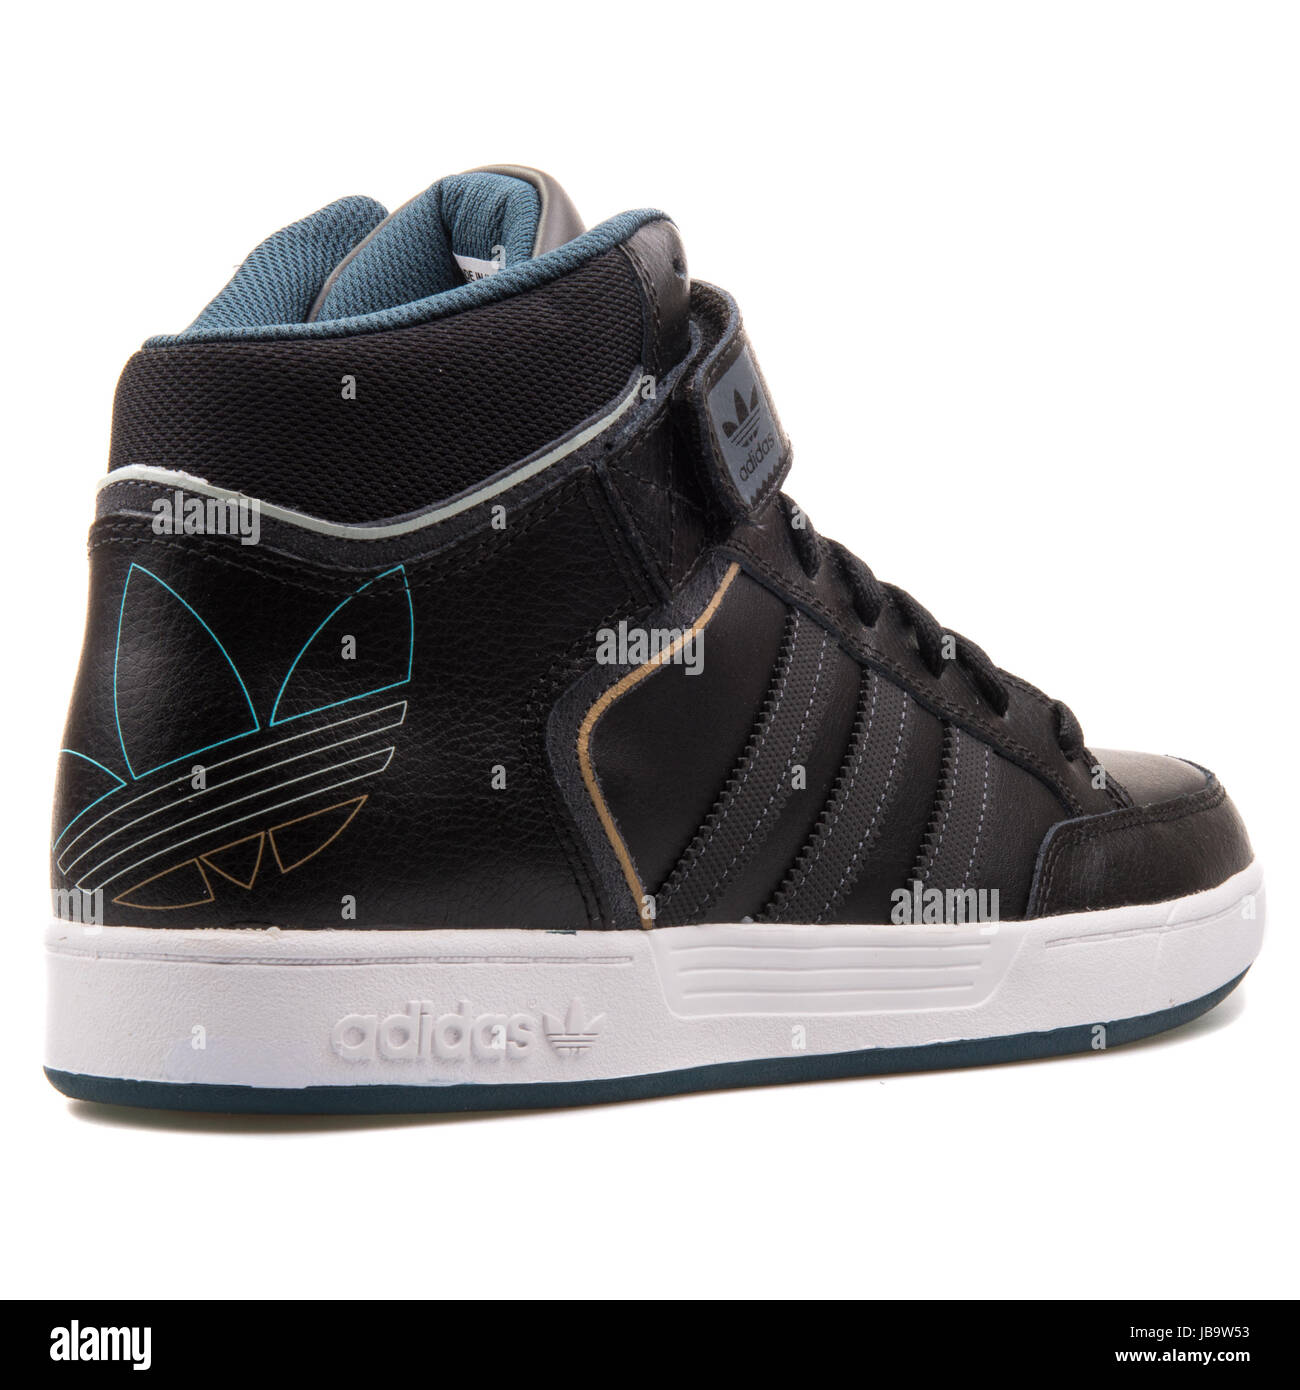 Herren Schuhe Hohe Sneaker adidas Varial Mid Schuhe weiß